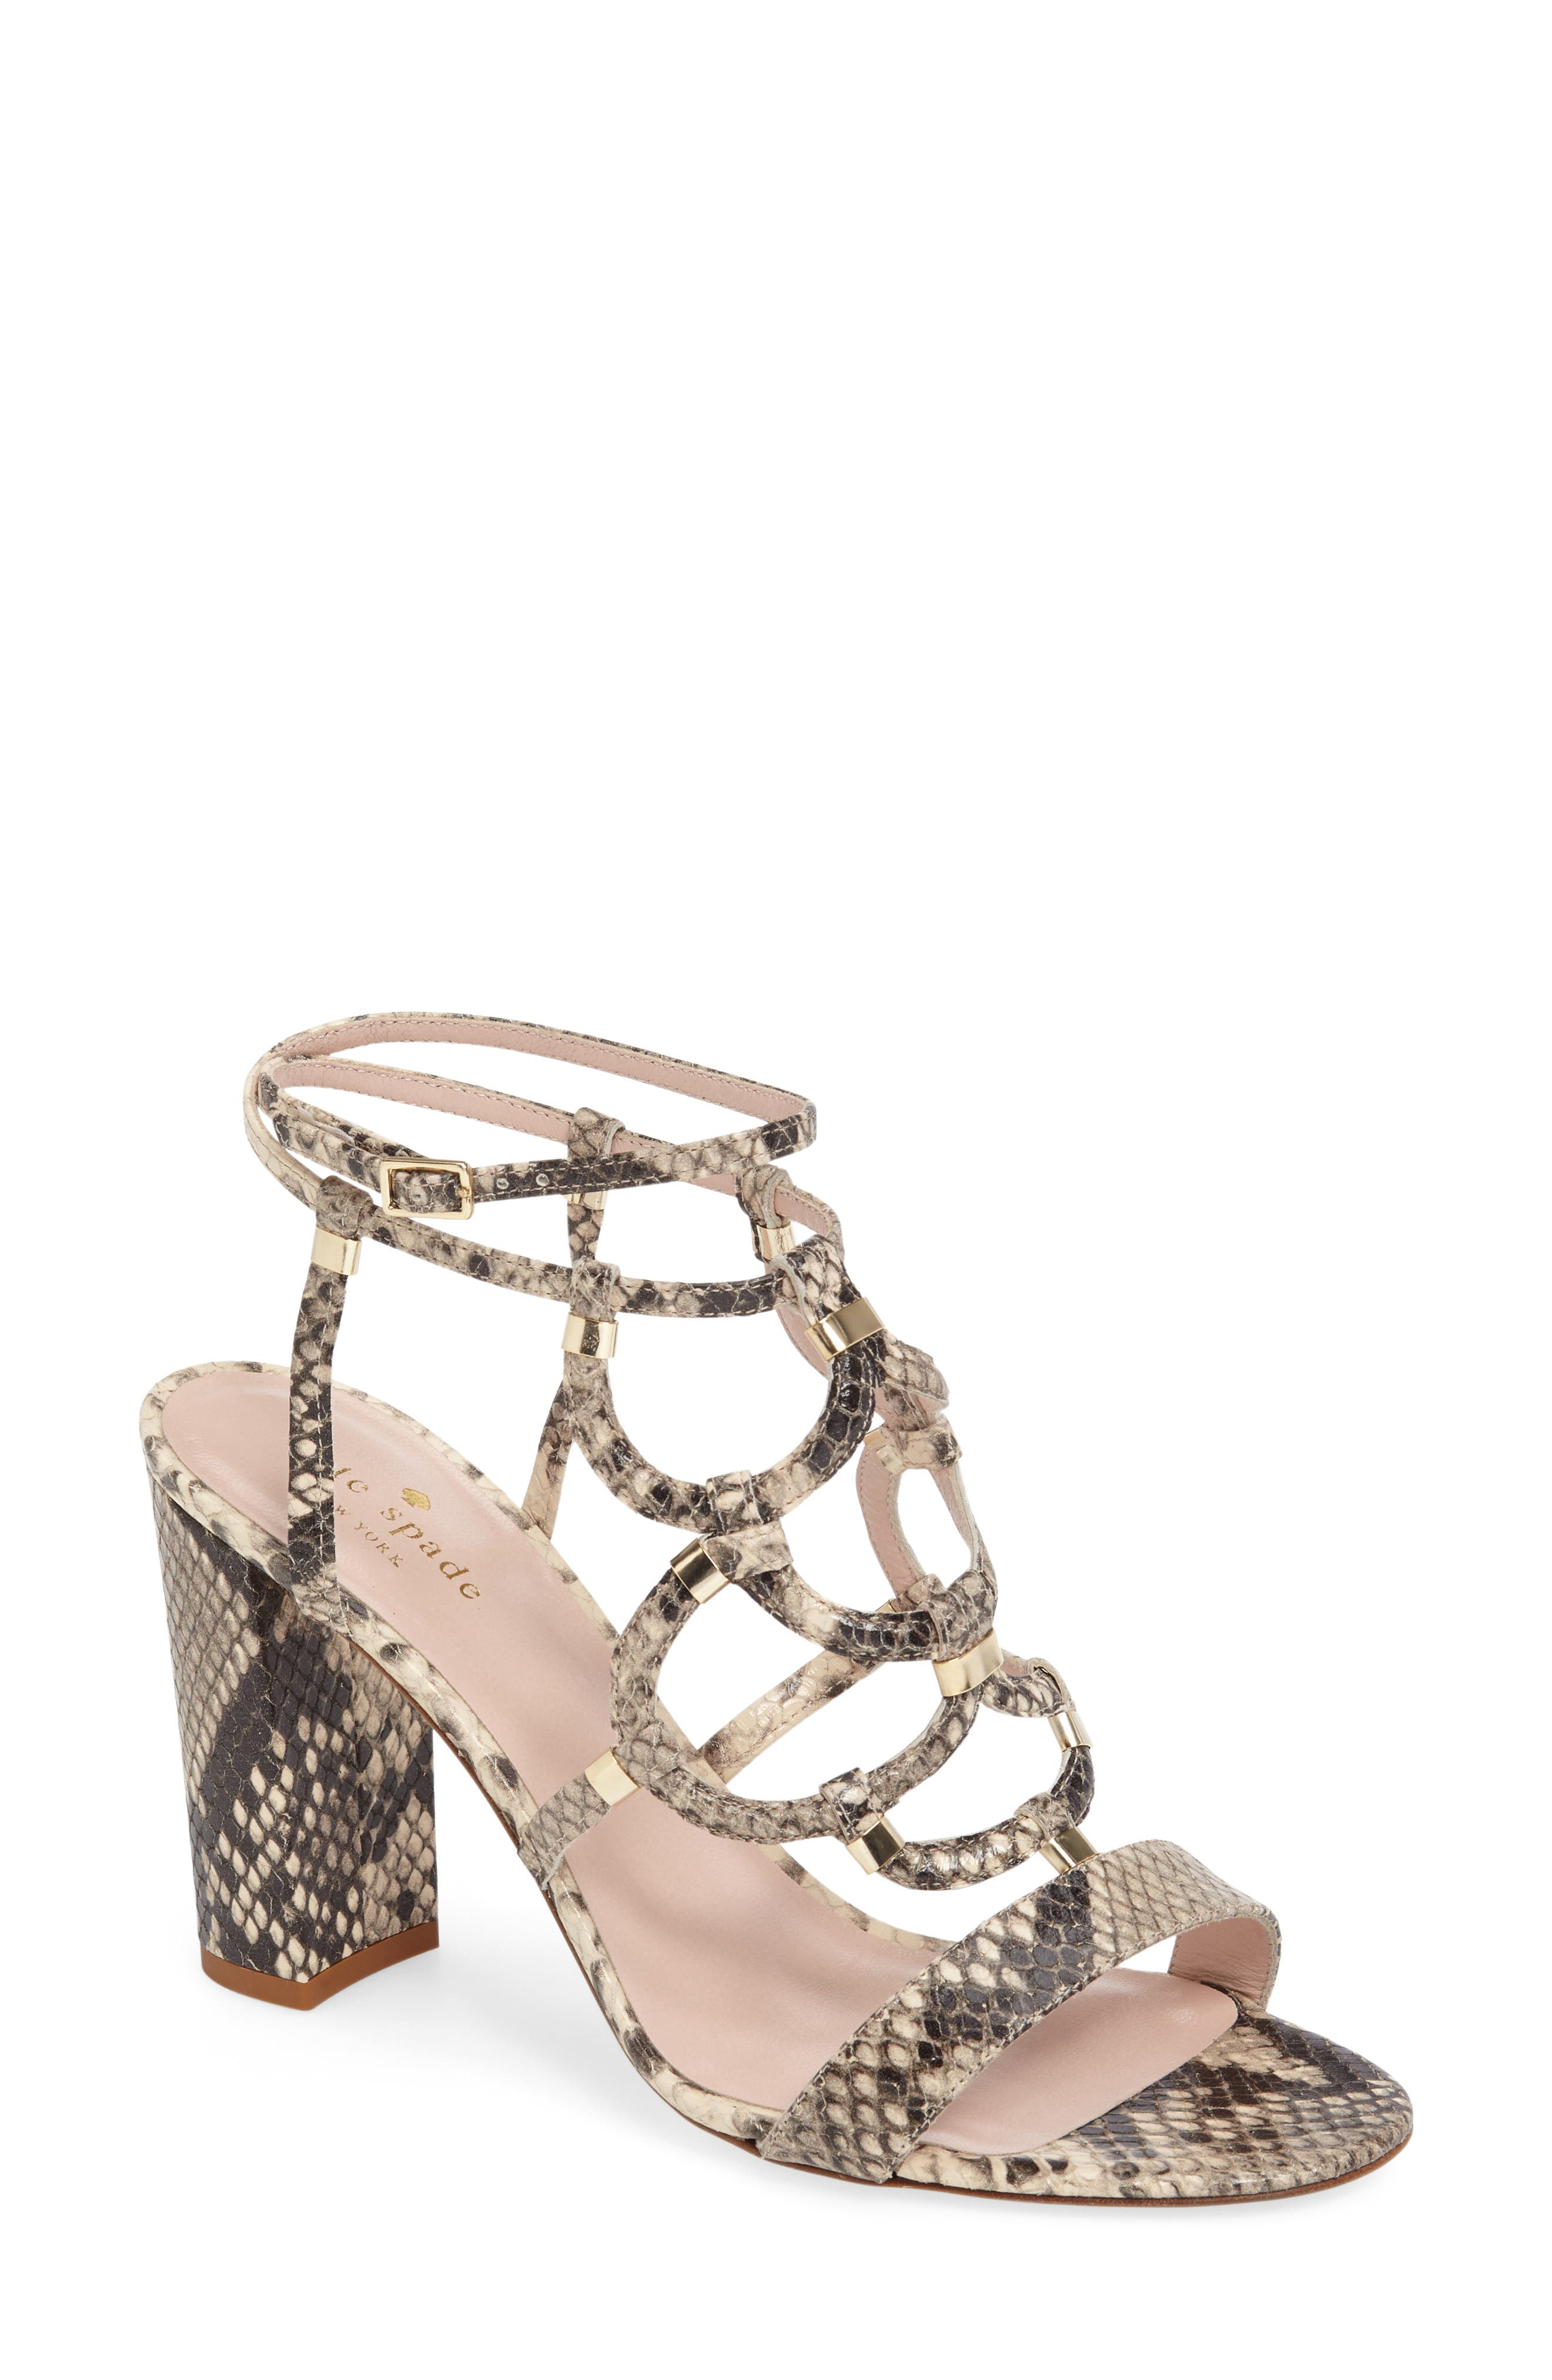 kate spade new york irving strappy sandal (Women)